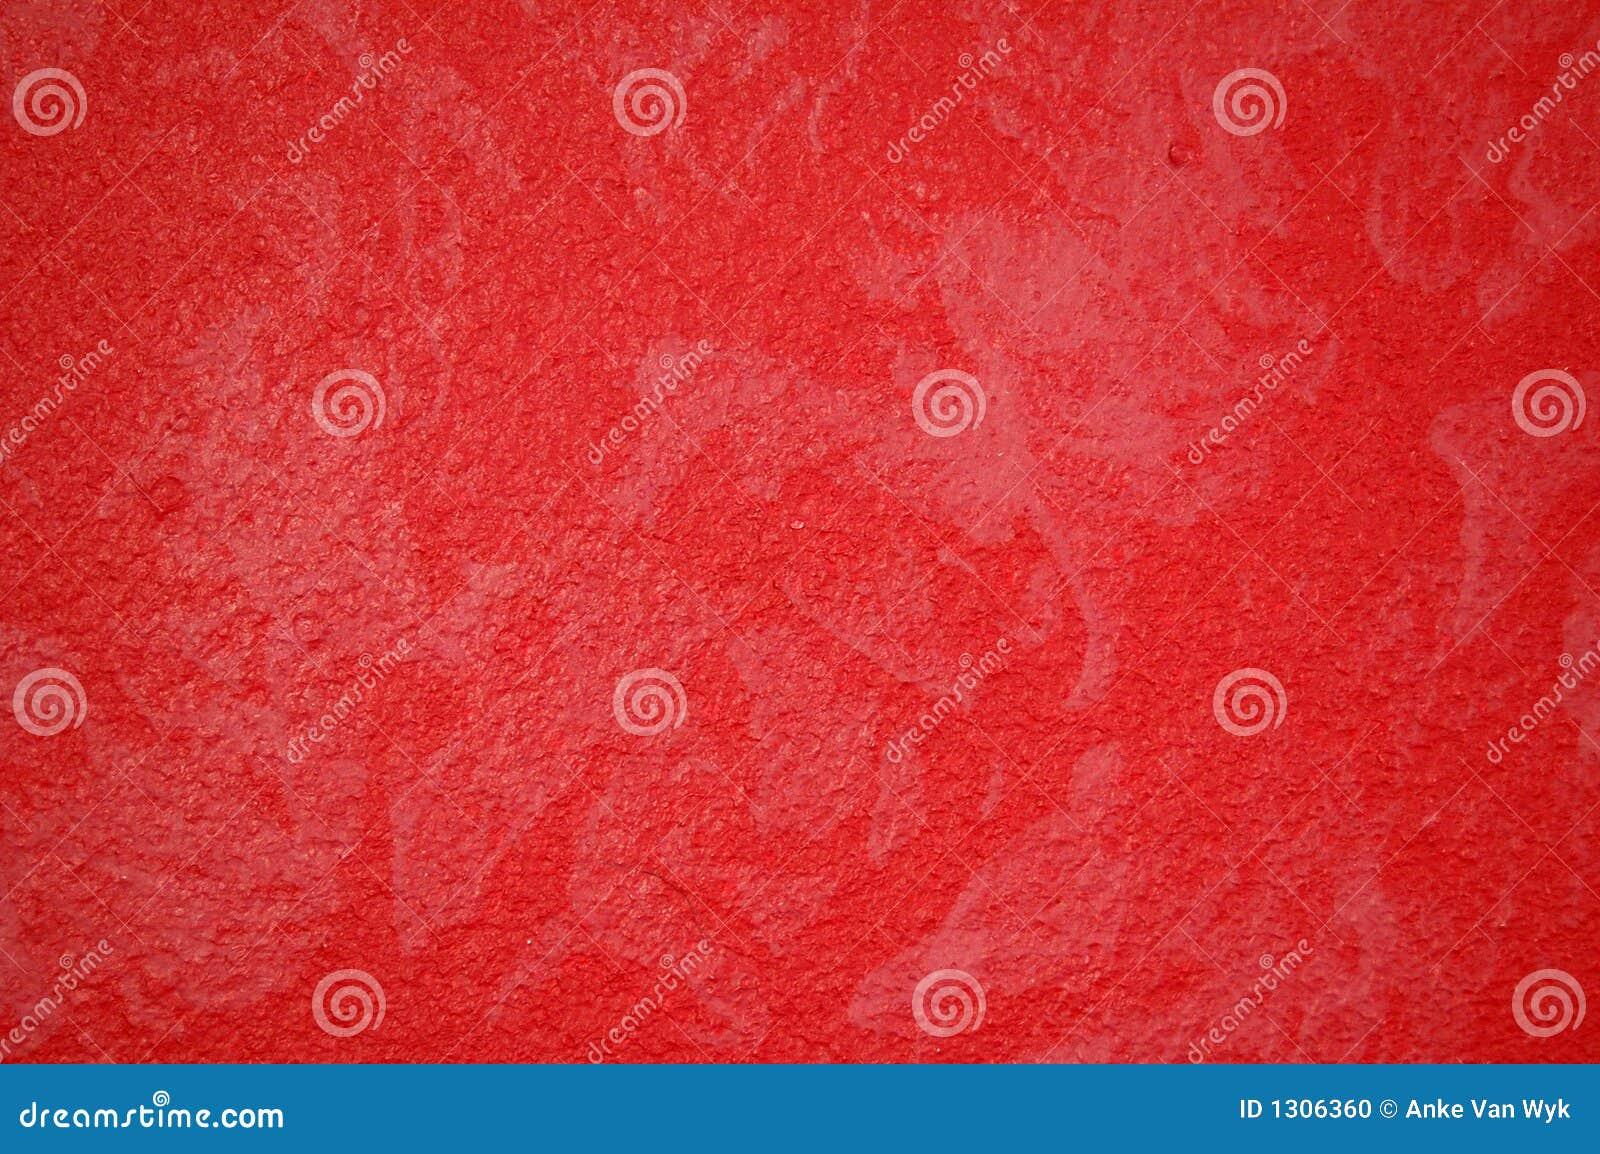 Rote tapete stockfoto bild von hell gekr mmt auszug for Rote tapete